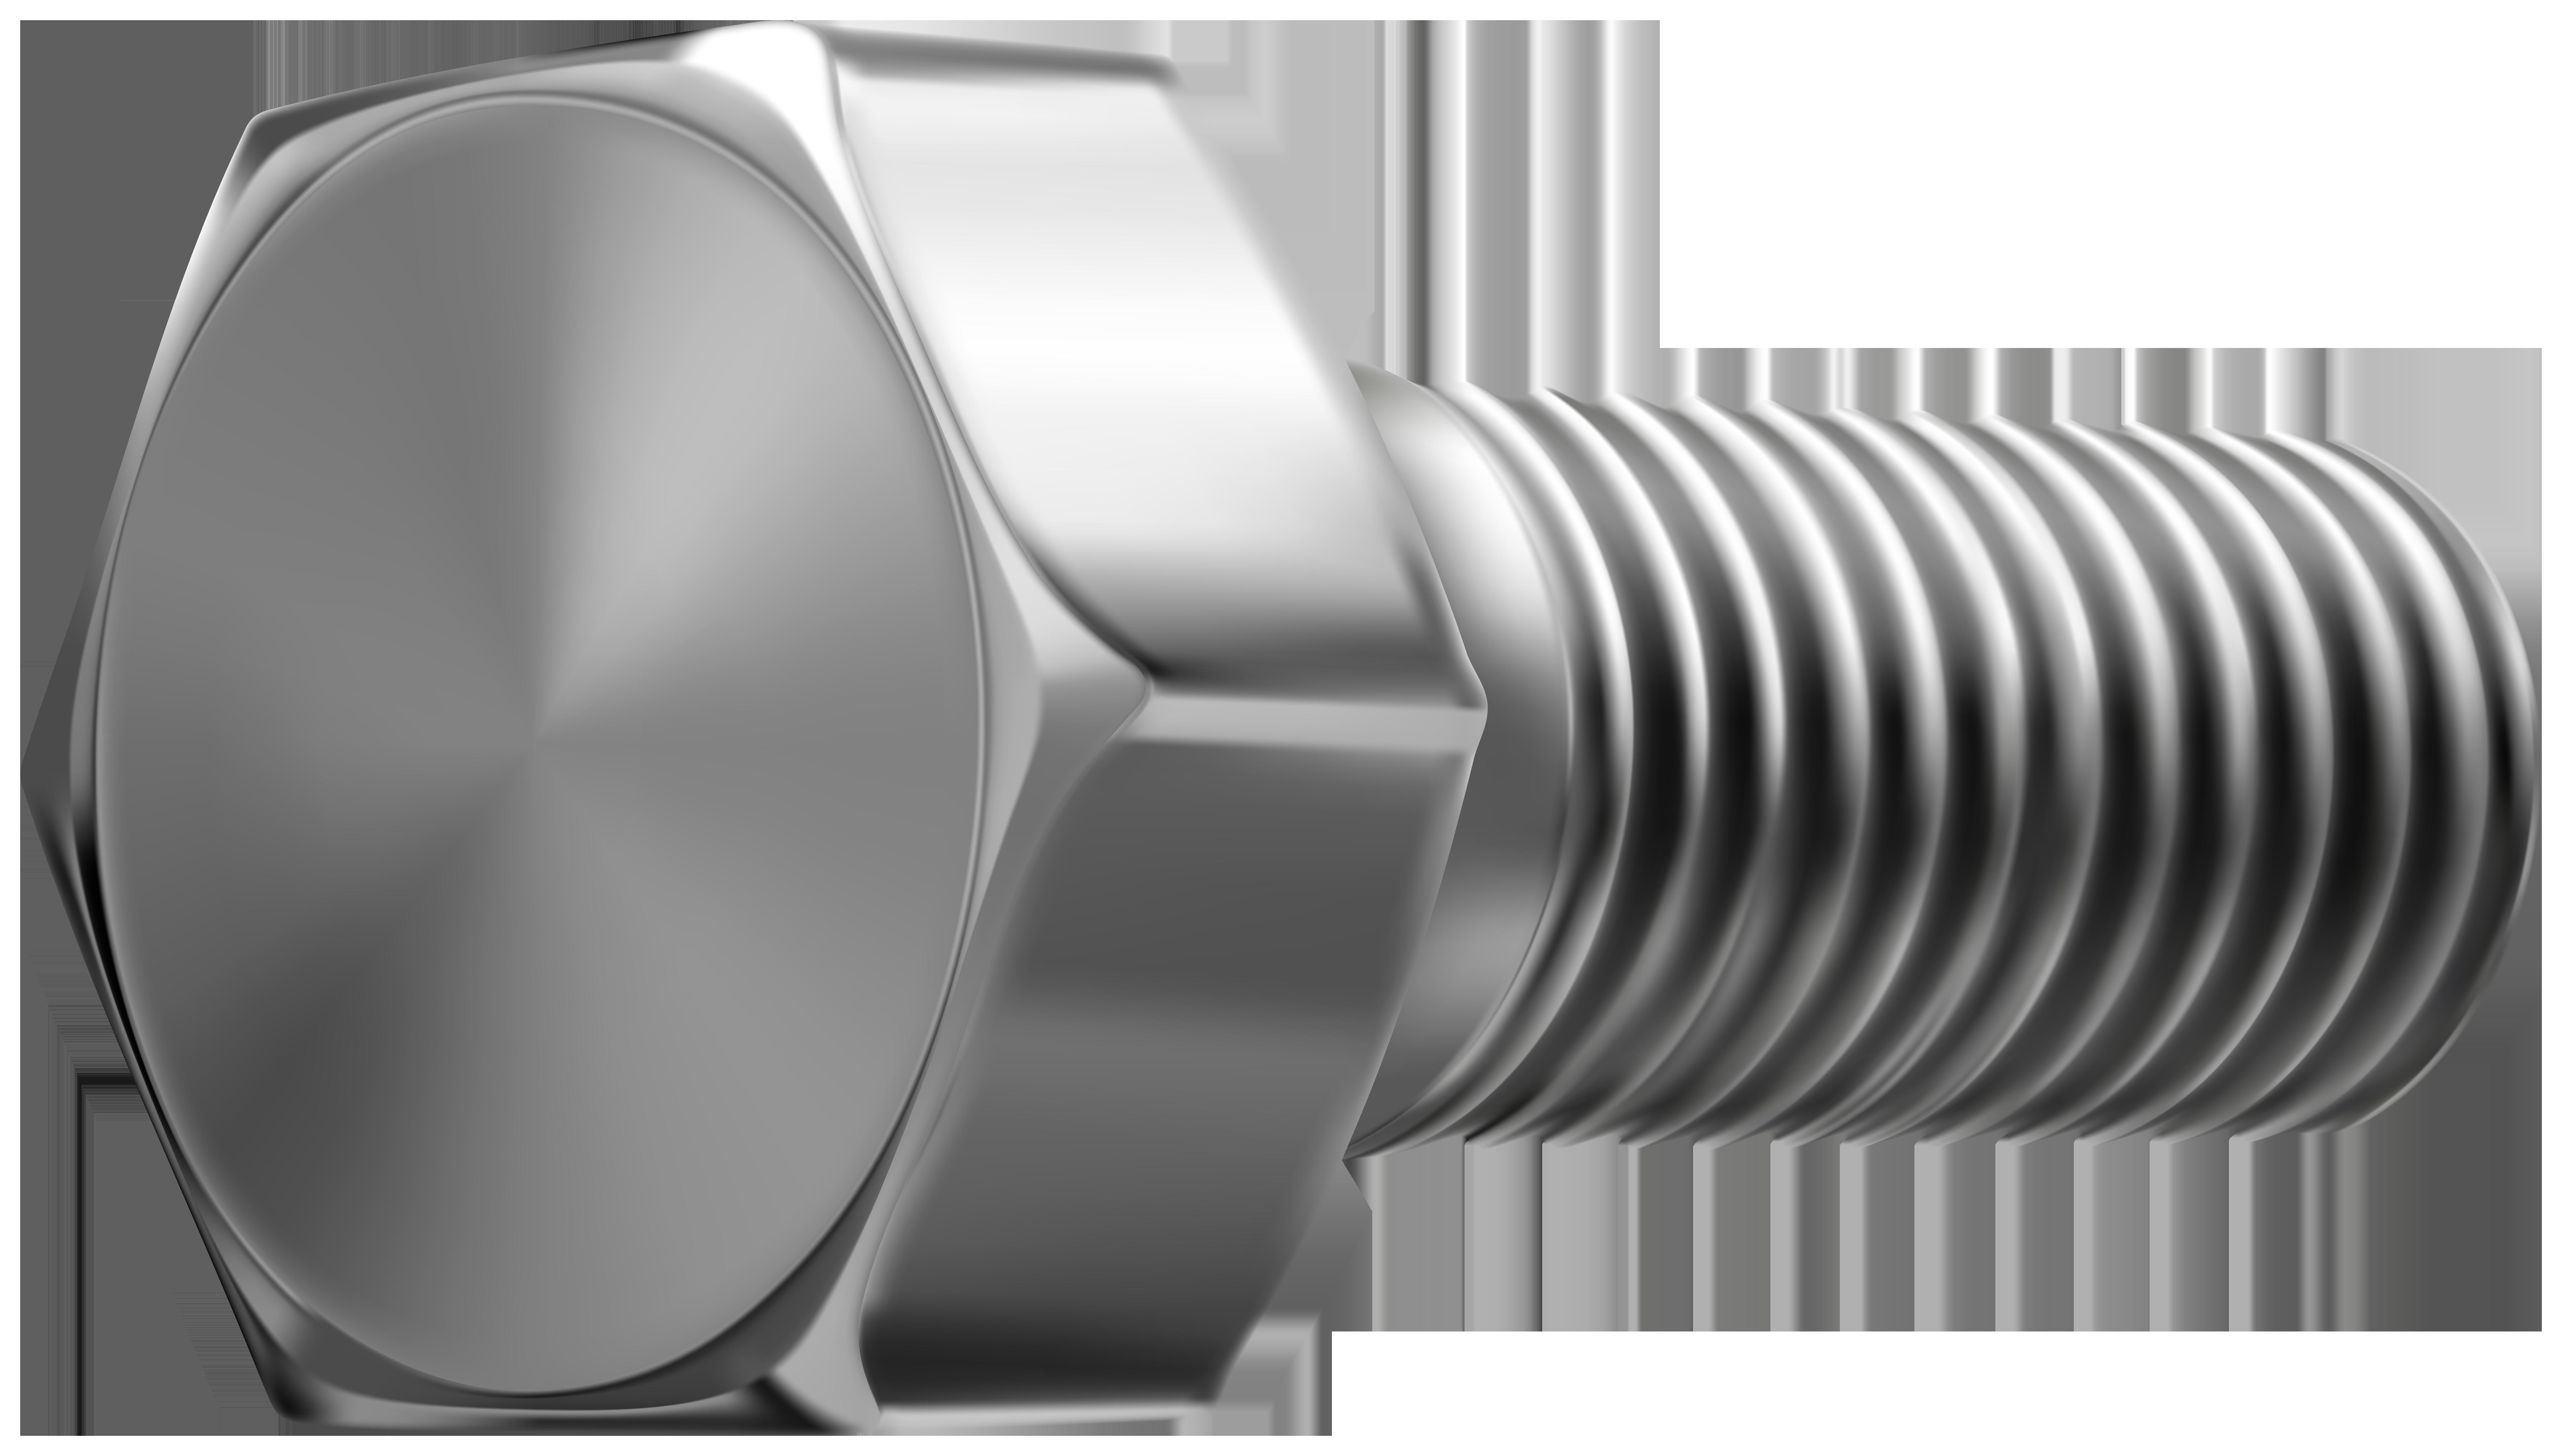 Bolt PNG Clipart Image.